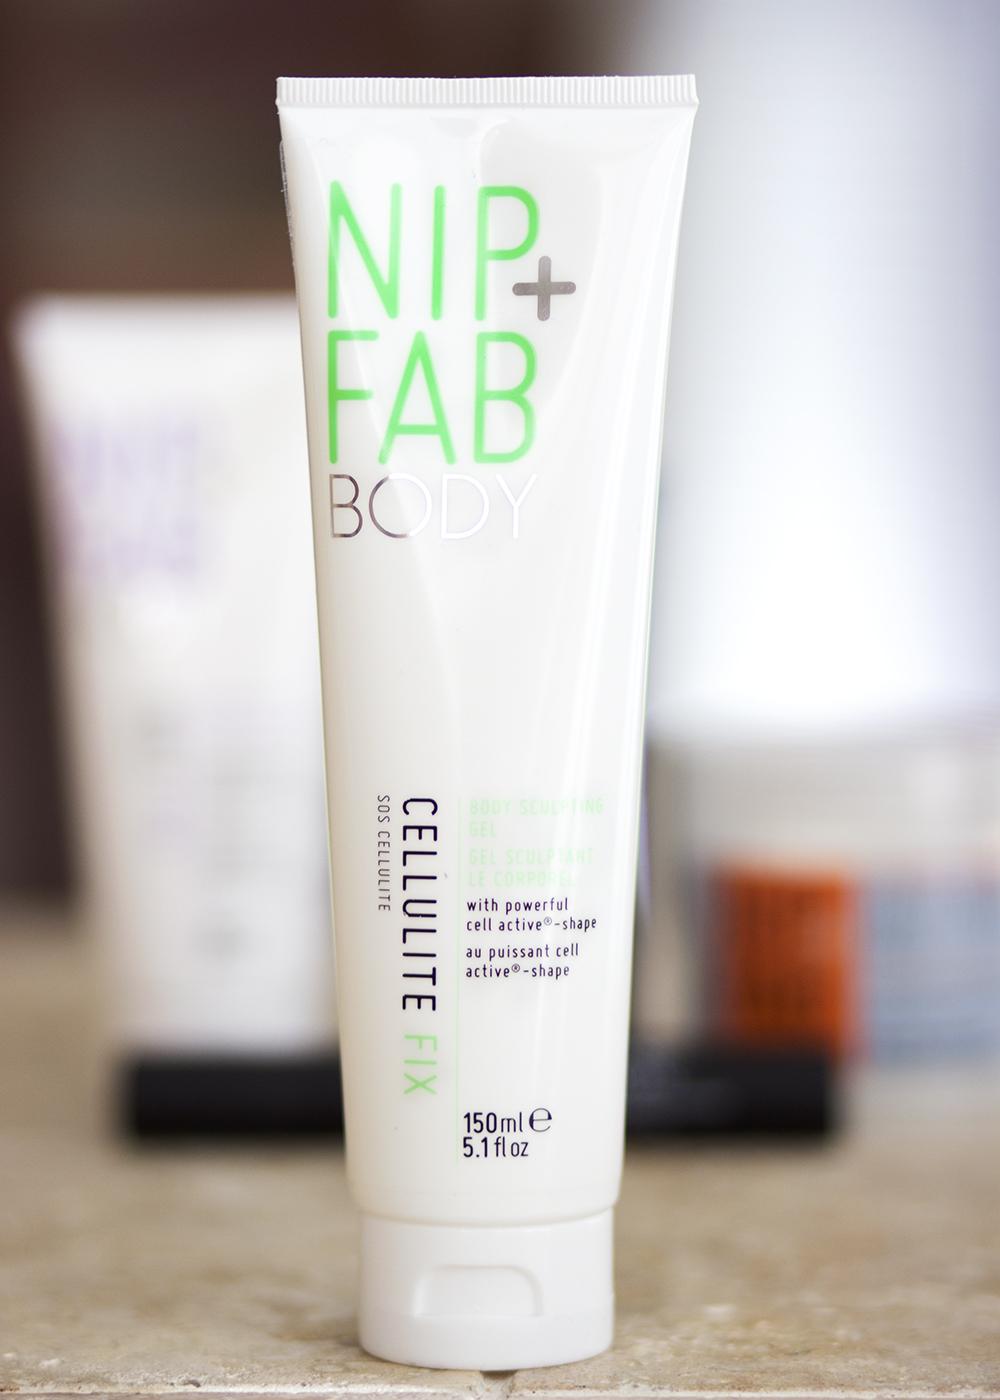 Rodial and Nip + Fab Beauty - Nip + Fab Body Cellulite Fix Body Sculpting Gel - Rodial Nip Fab Beauty Review